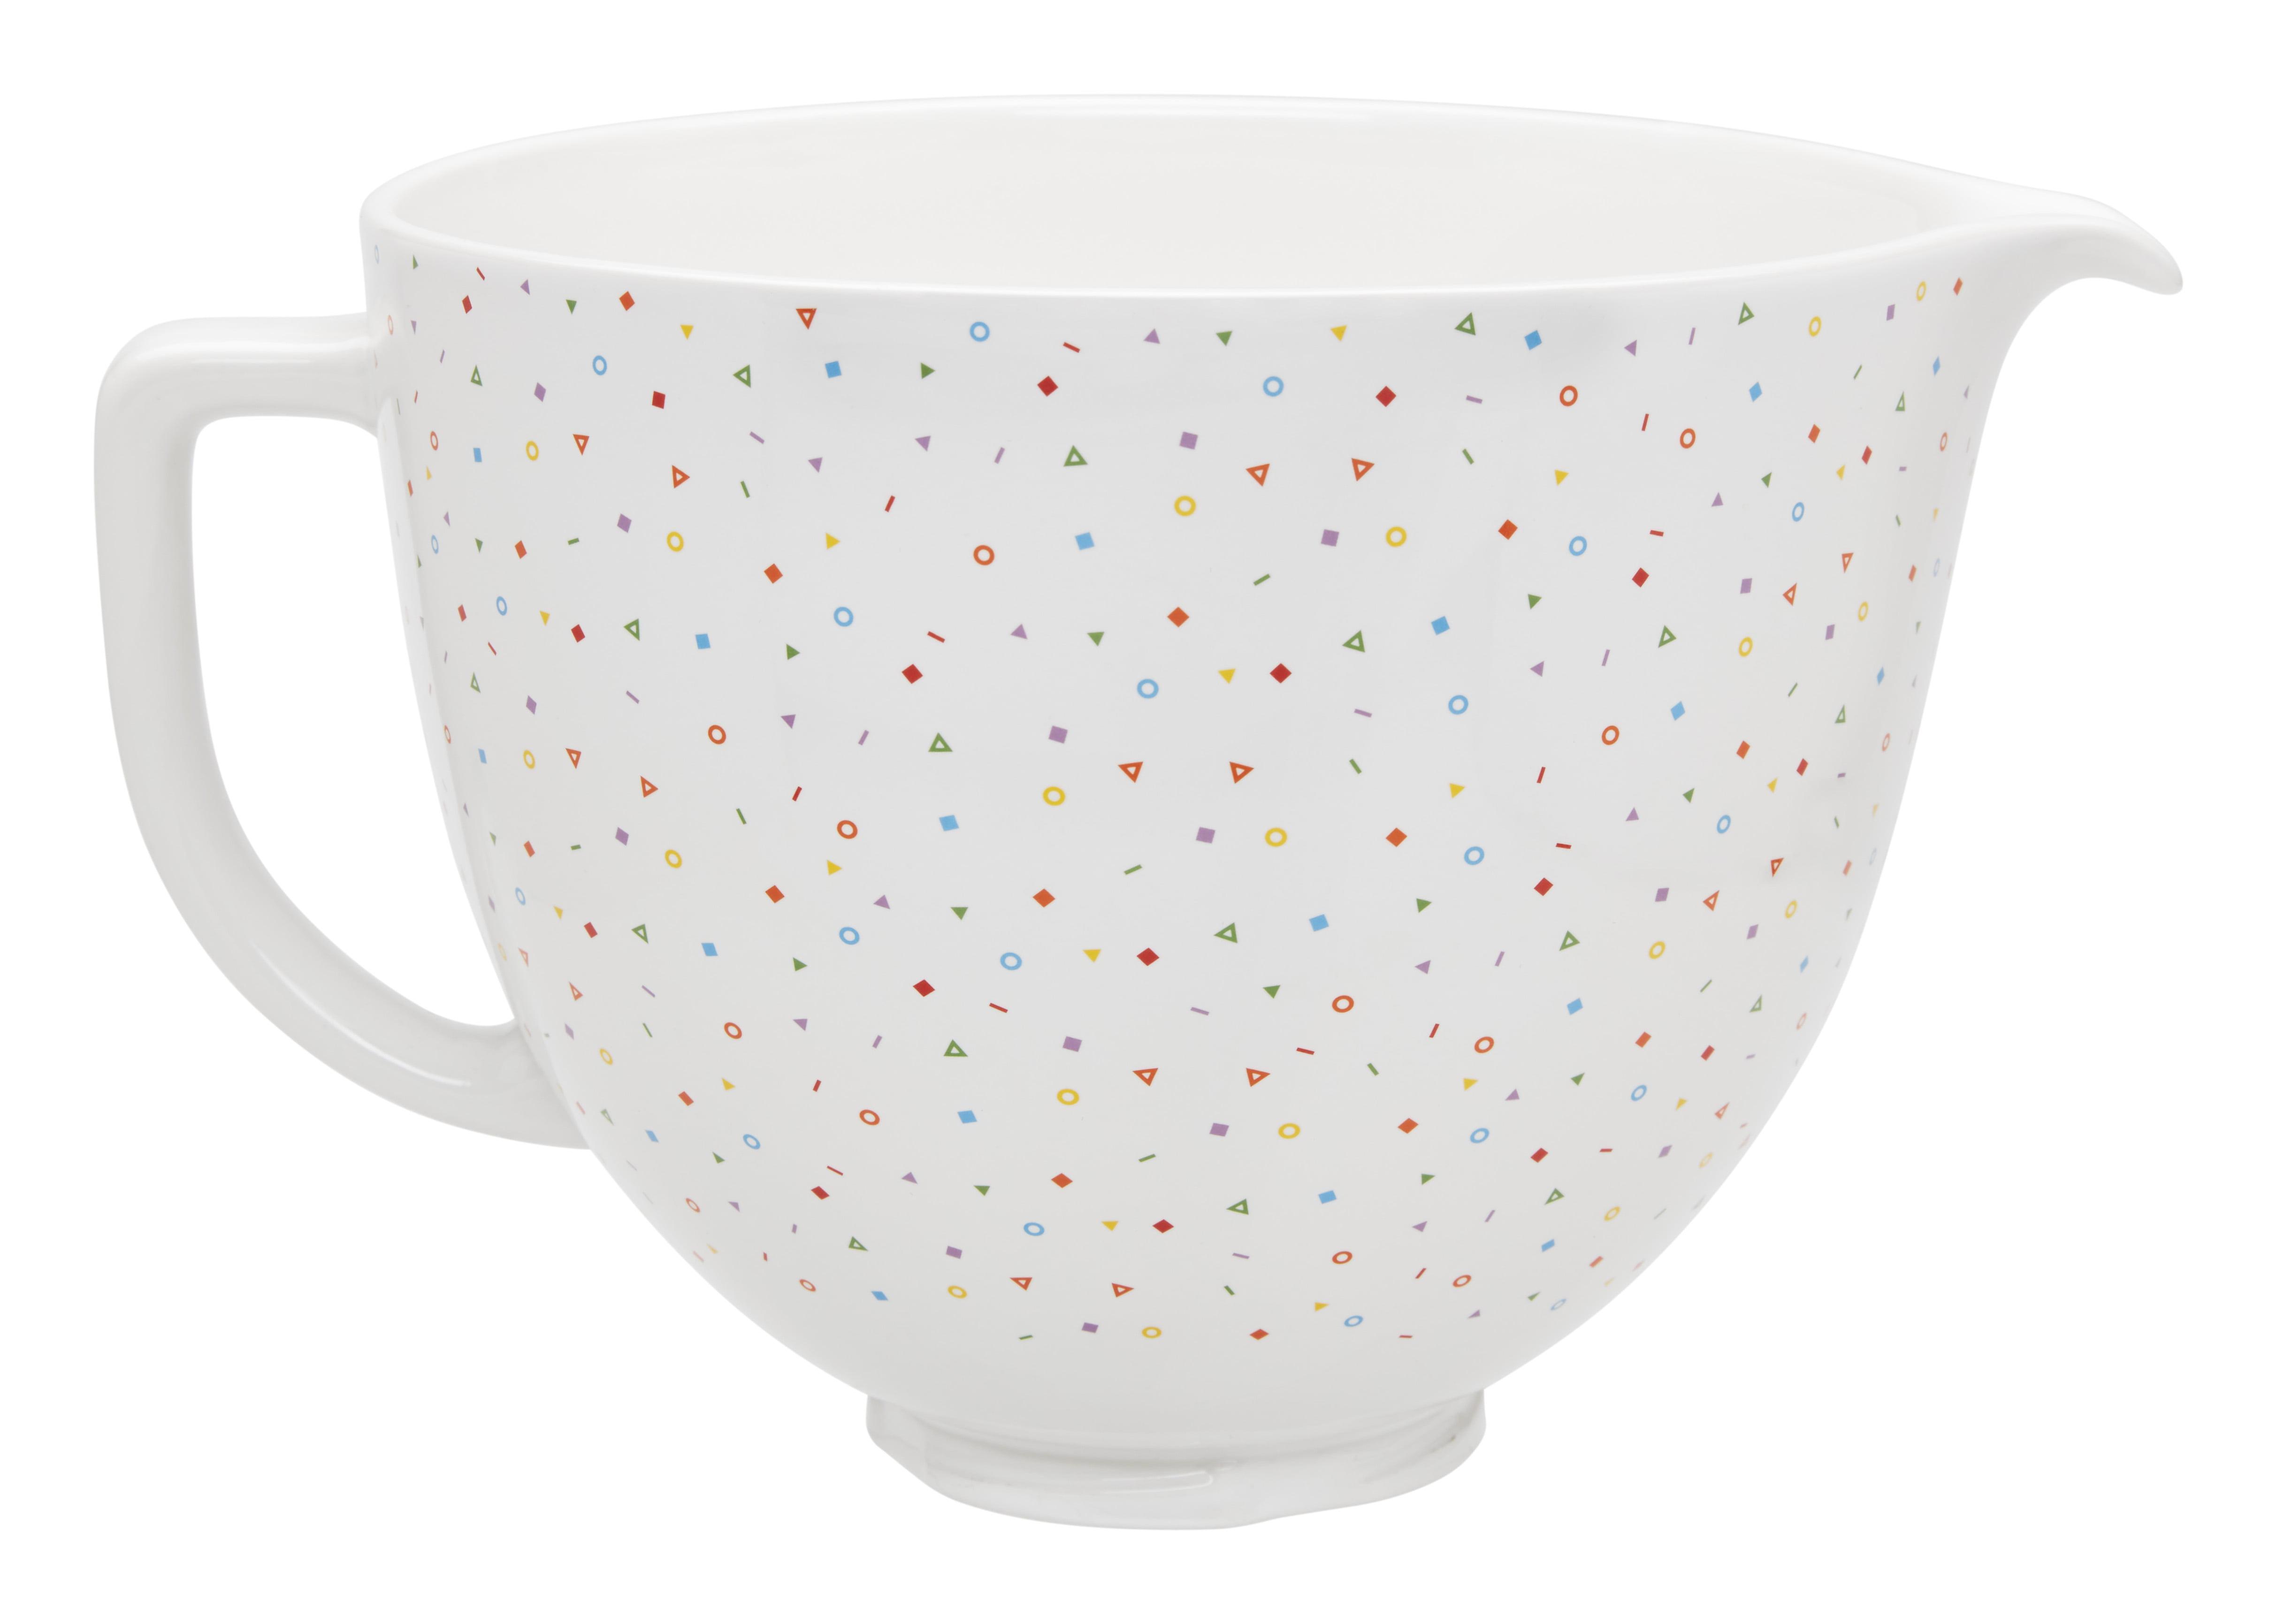 Kitchenaid 174 5 Quart Confetti Sprinkle Ceramic Bowl